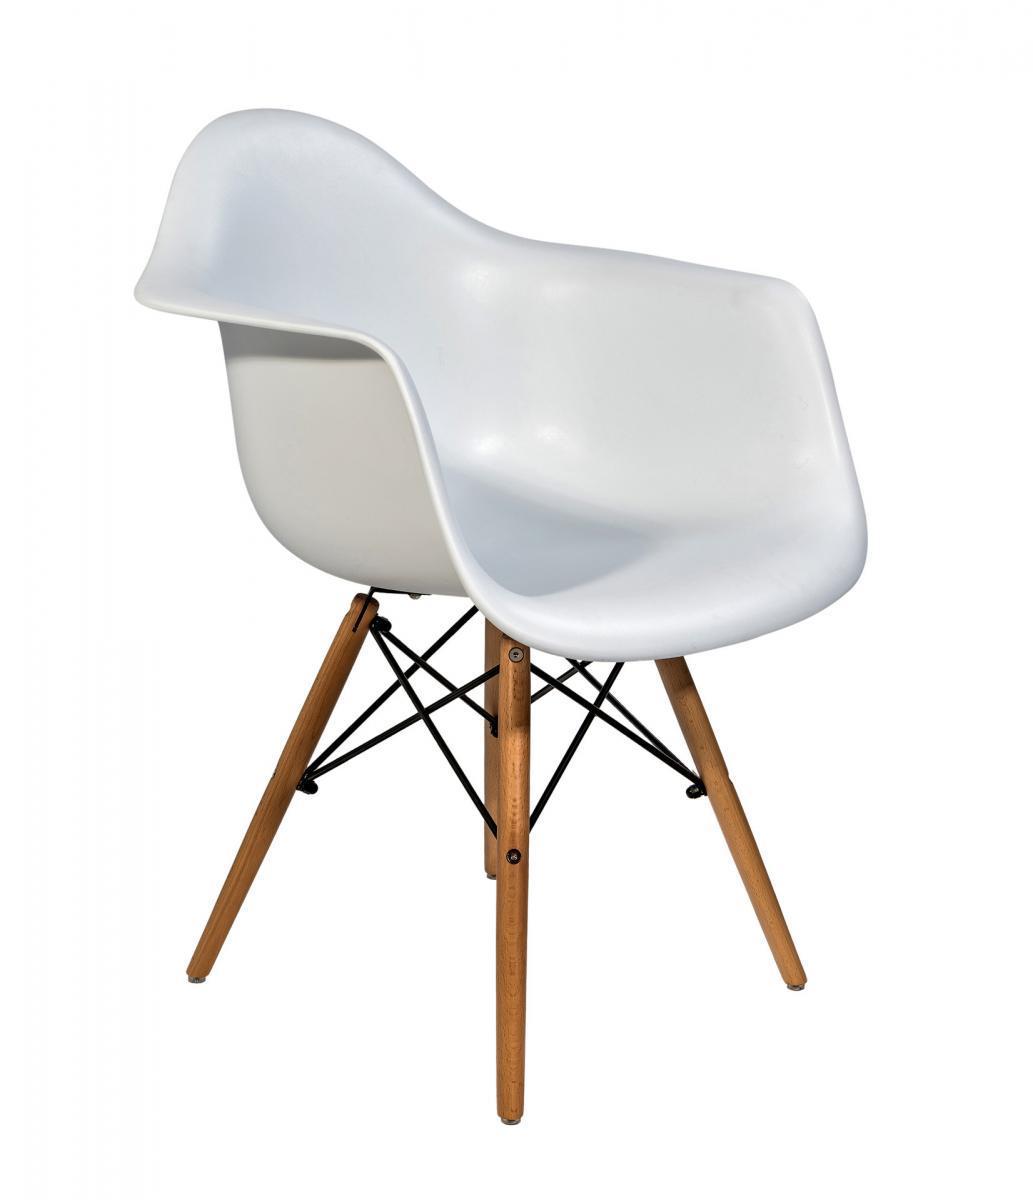 Кресло пластиковое Eames DAW